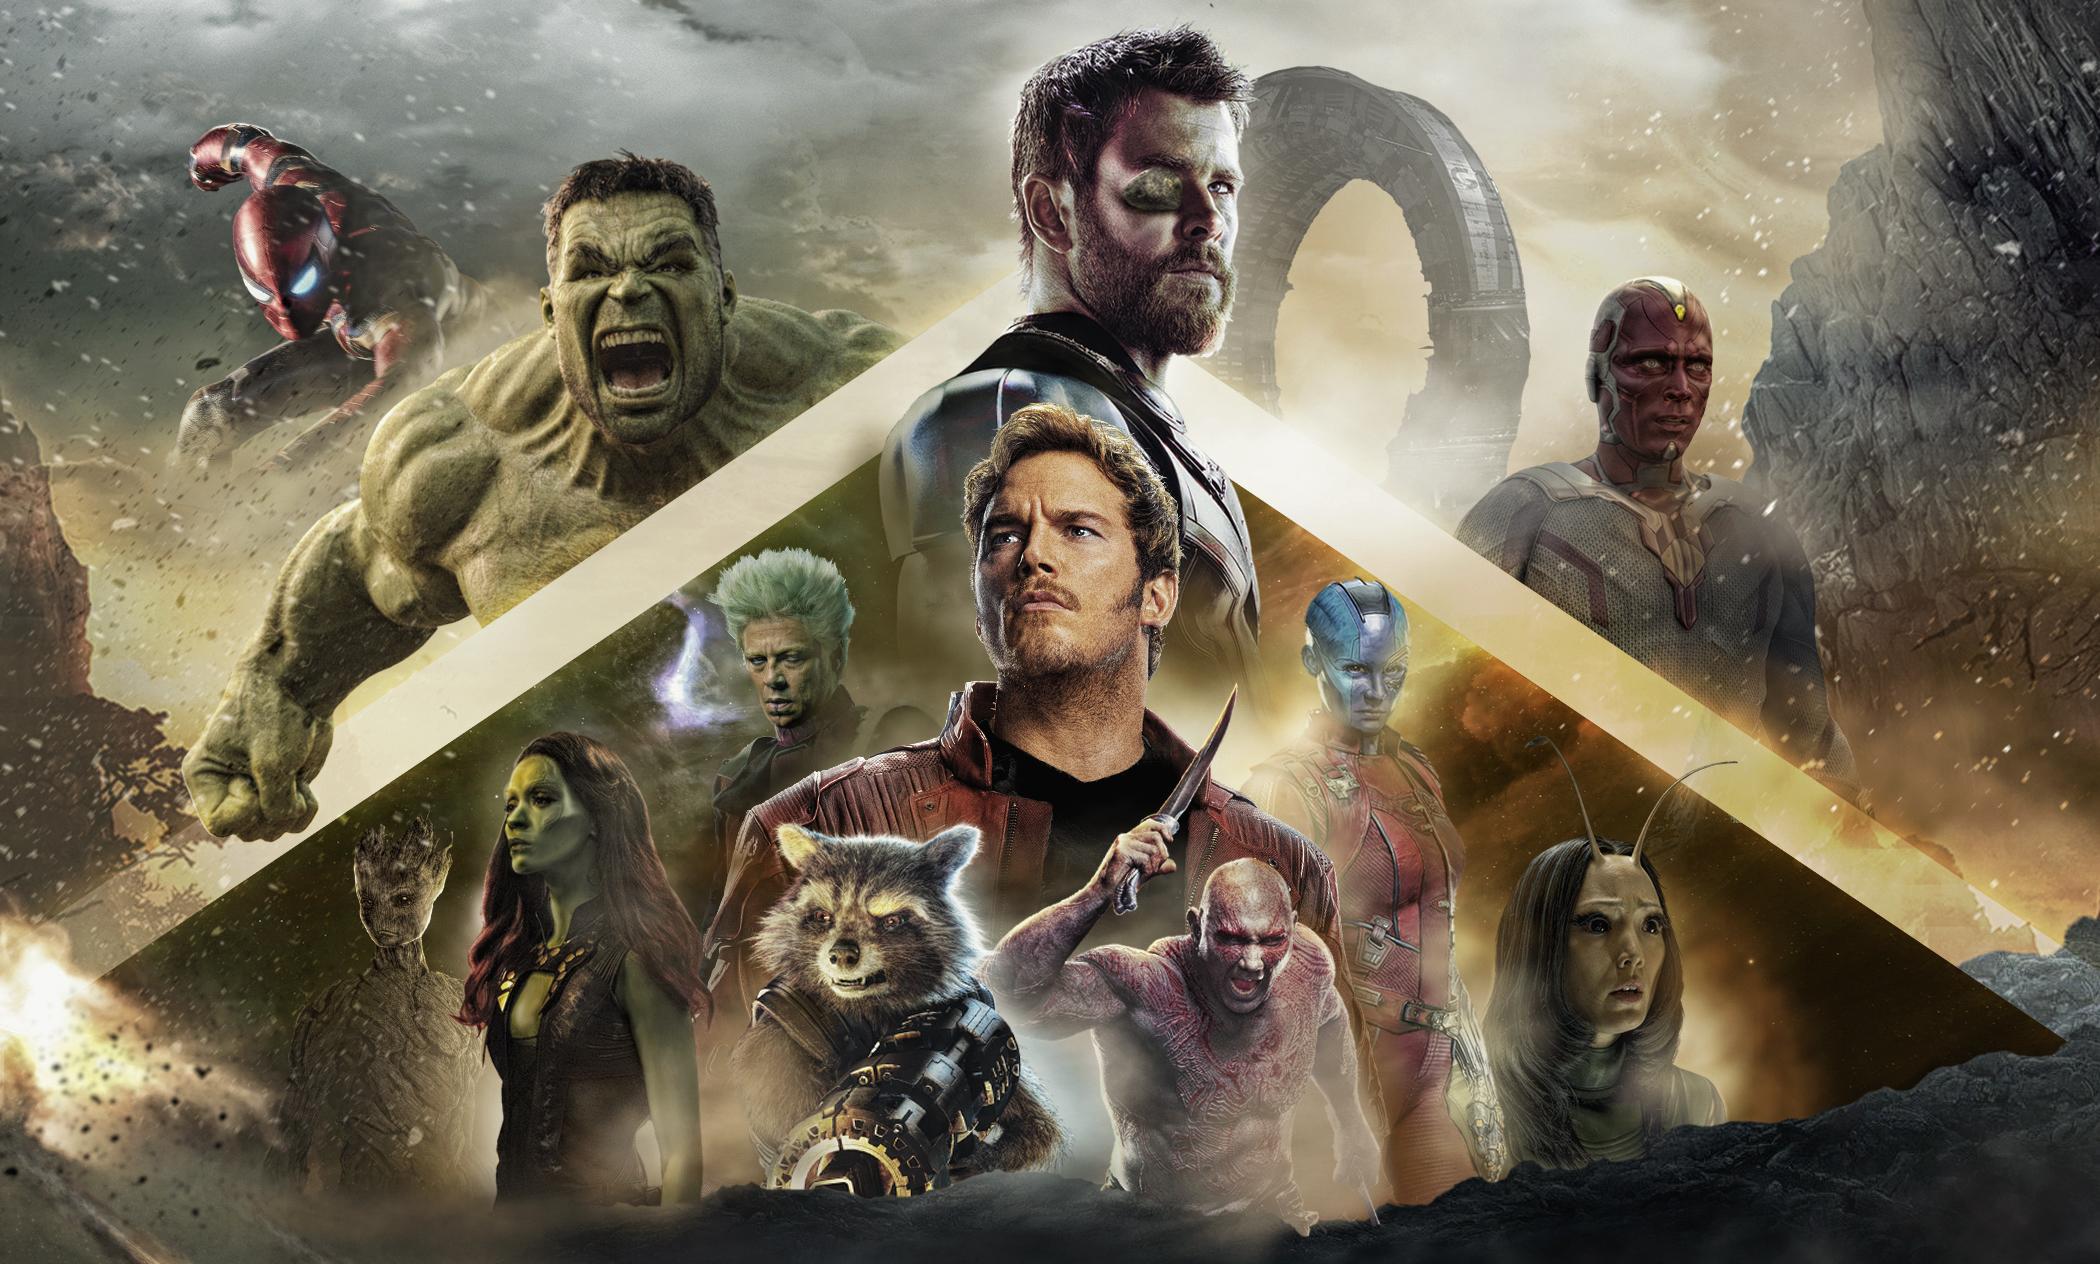 Shuri In Avengers Infinity War New Poster Hd Movies 4k: Avengers Infinity War Poster Fan Made, HD Movies, 4k